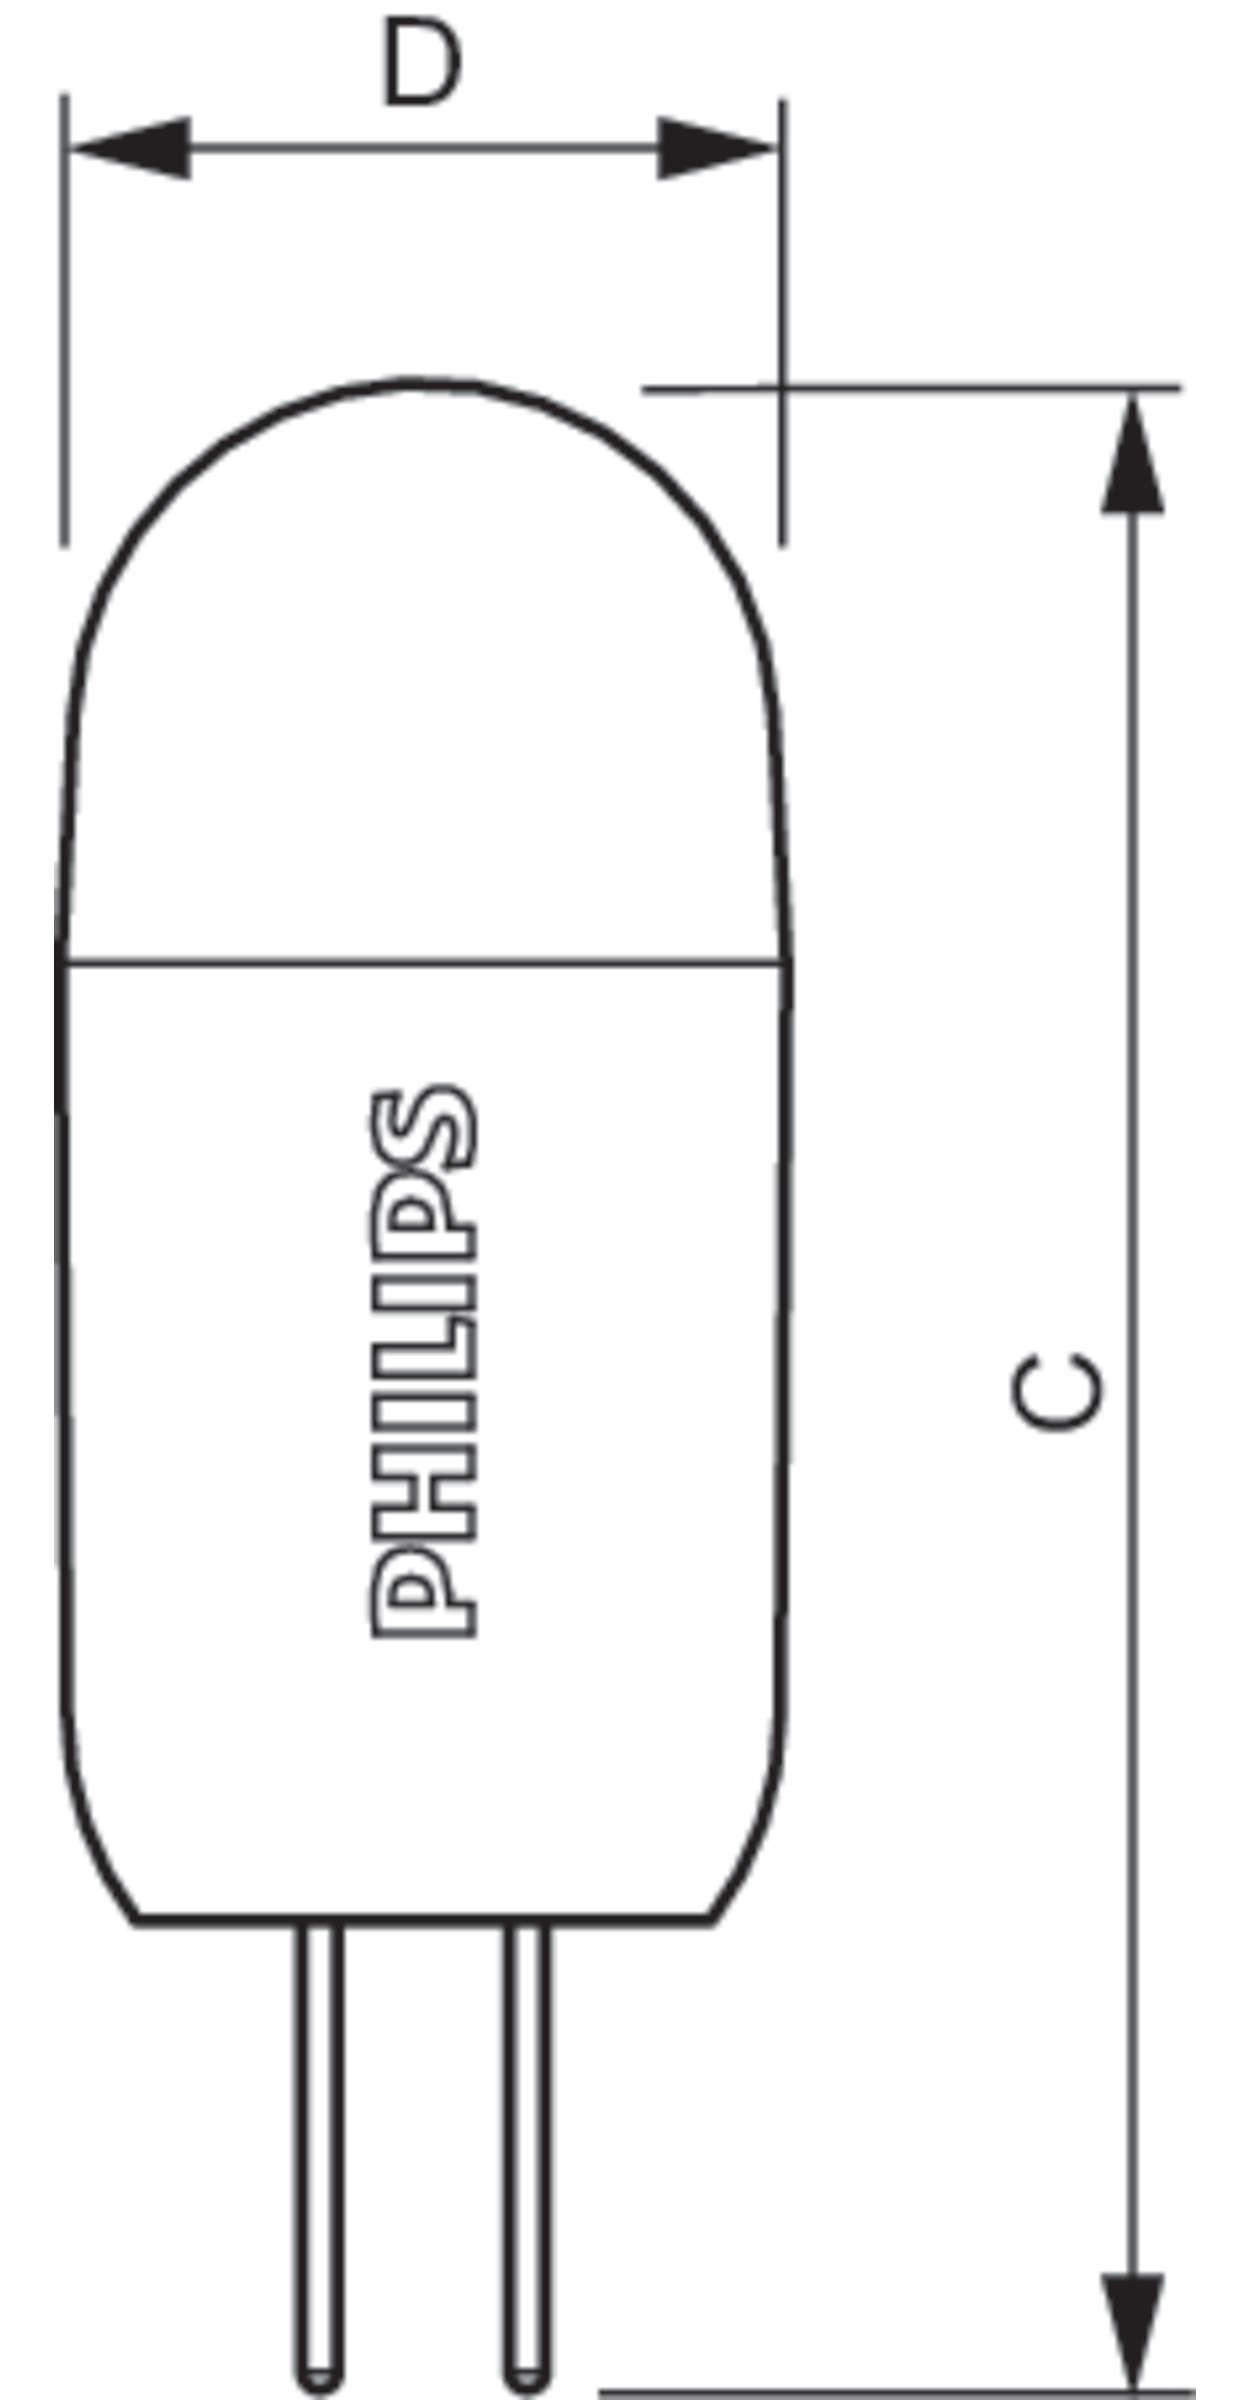 Philips Corepro Ledcapsulelv 2 20w 827 G4 D